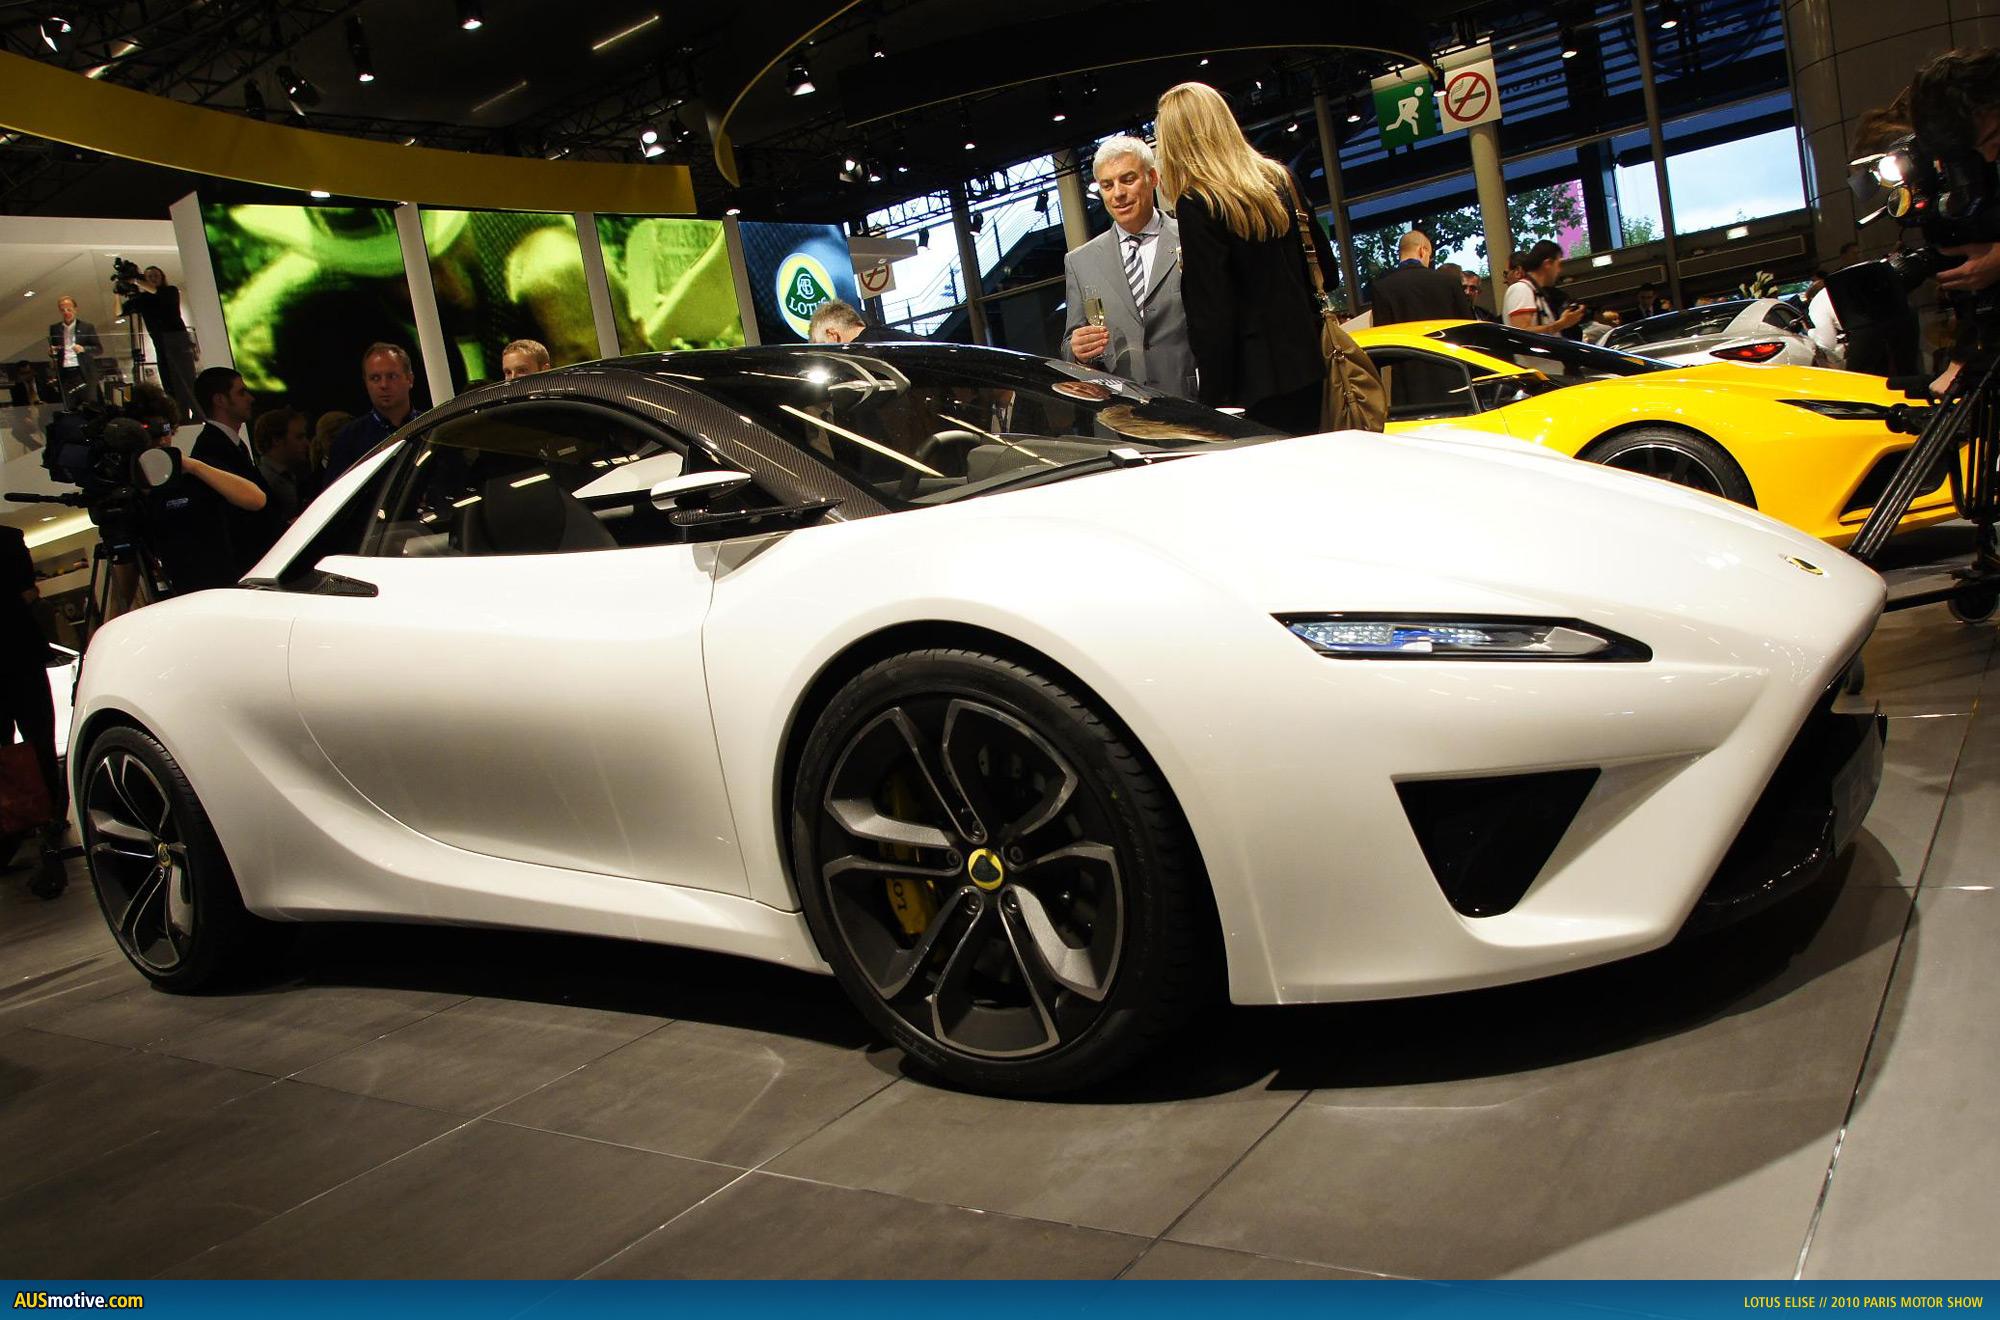 http://www.ausmotive.com/images2/Lotus-Elise-07.jpg